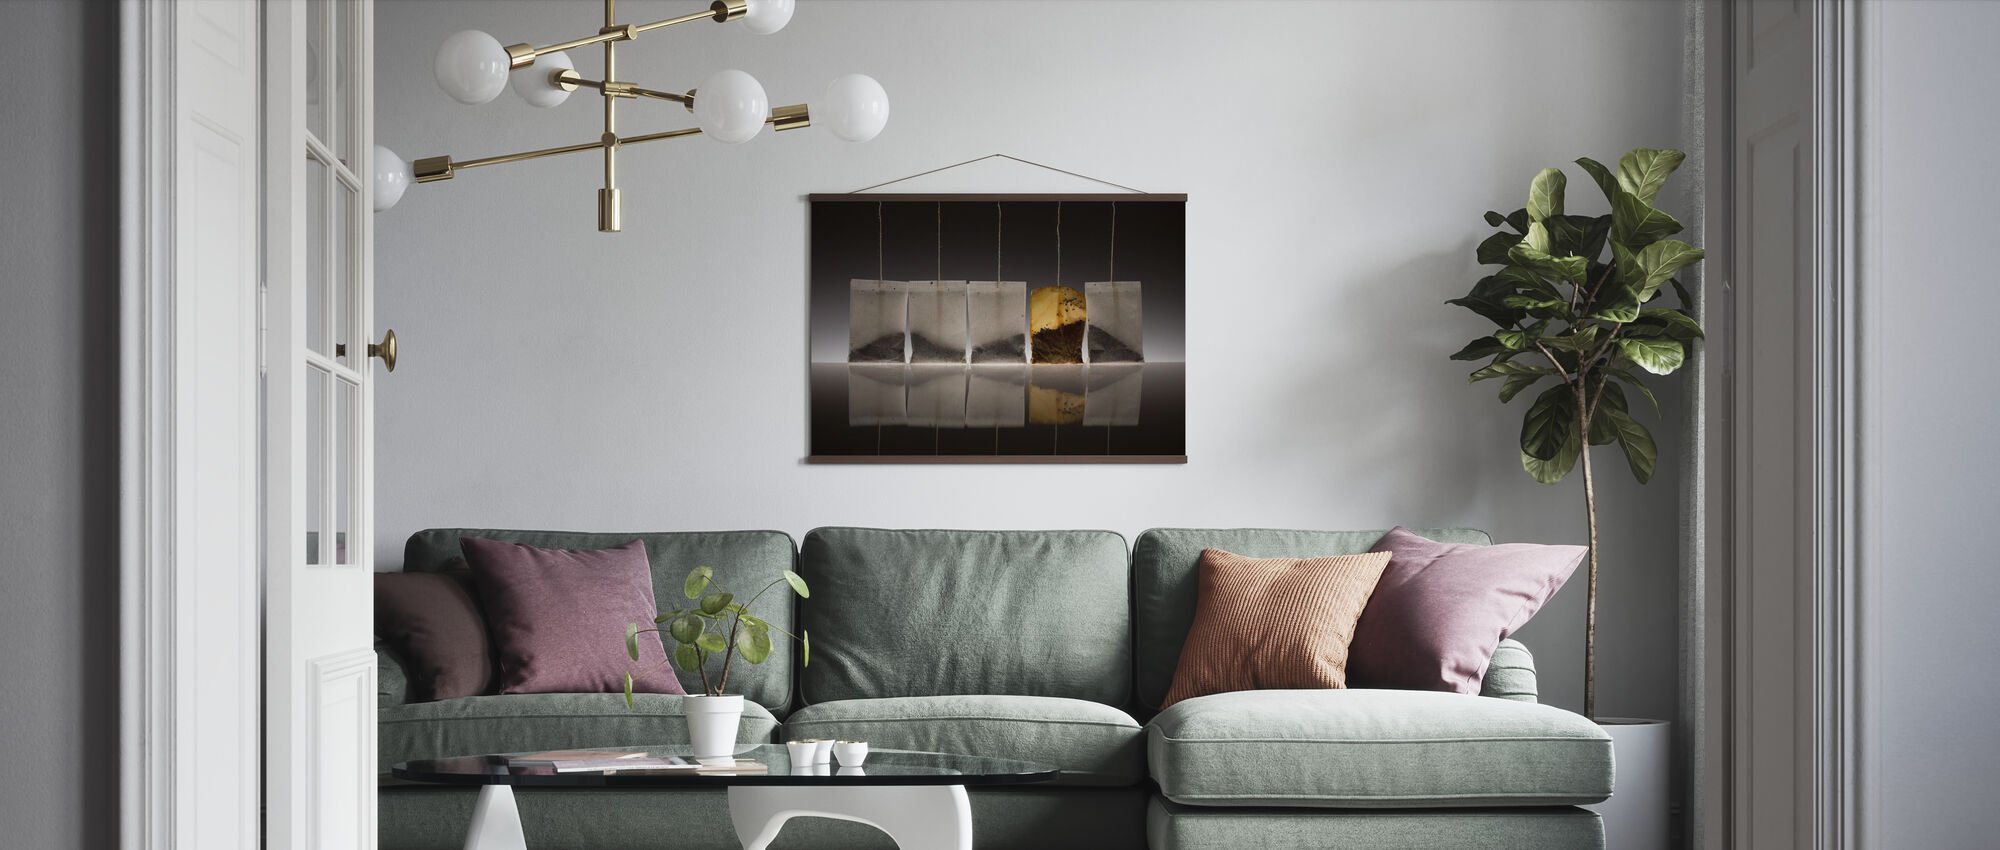 Teascape - Poster - Living Room